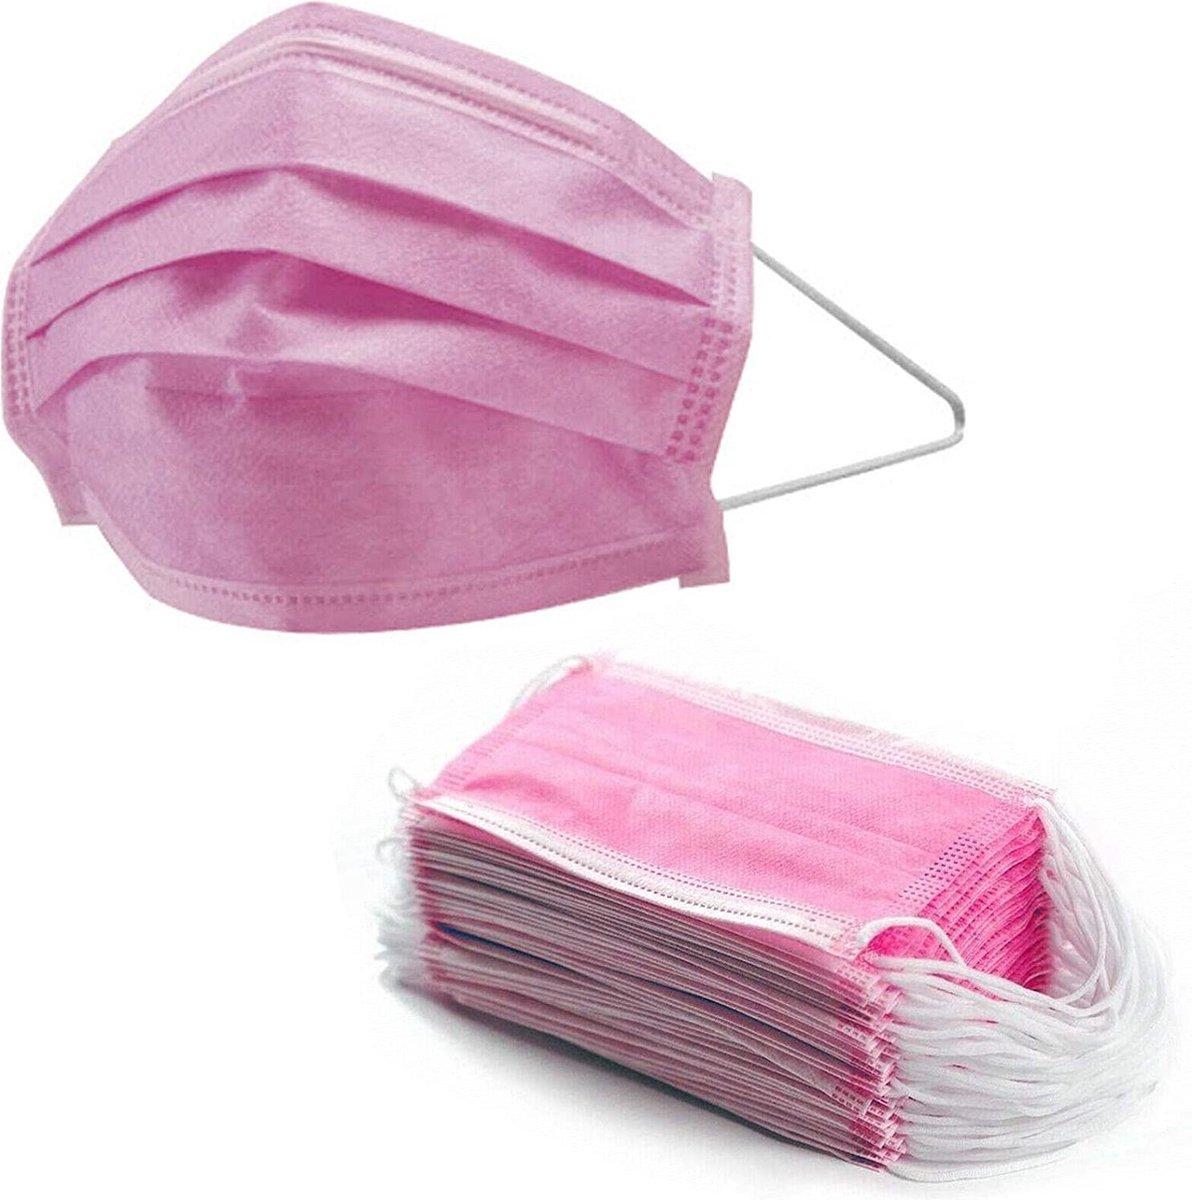 50 stuks Roze 3 laags wegwerp mondkapjes | Mondmasker niet Medisch